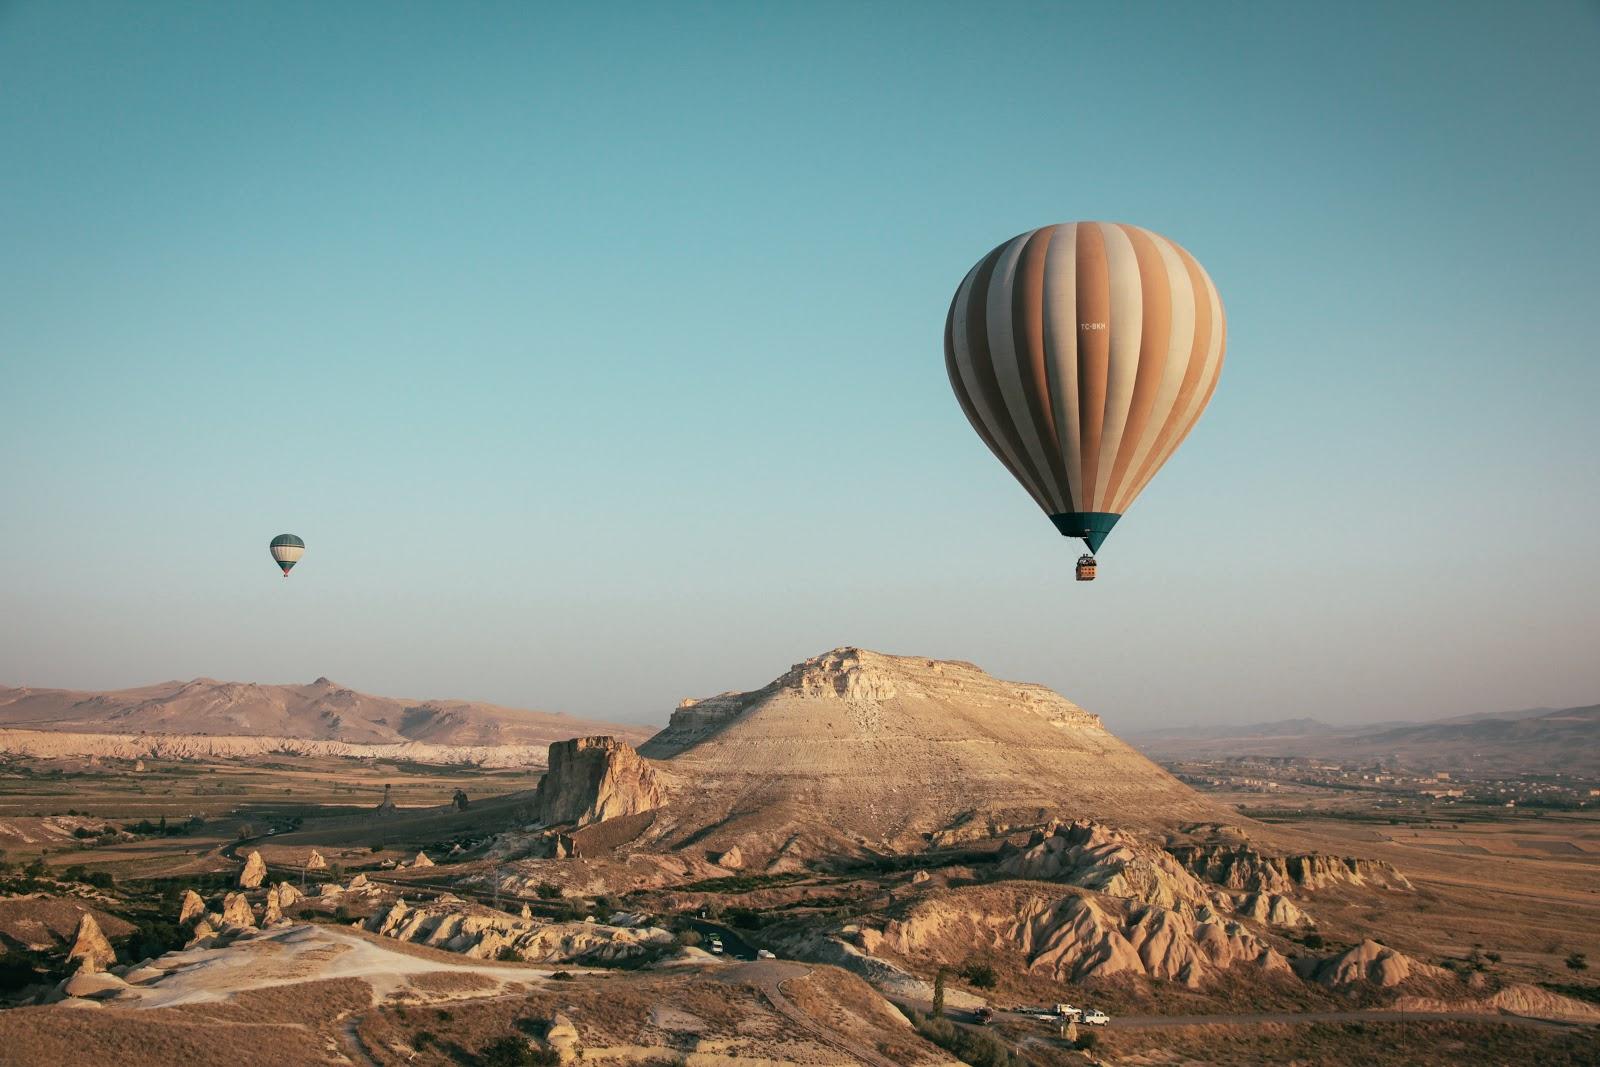 Cappadocia, Balloon flight, Turkey,